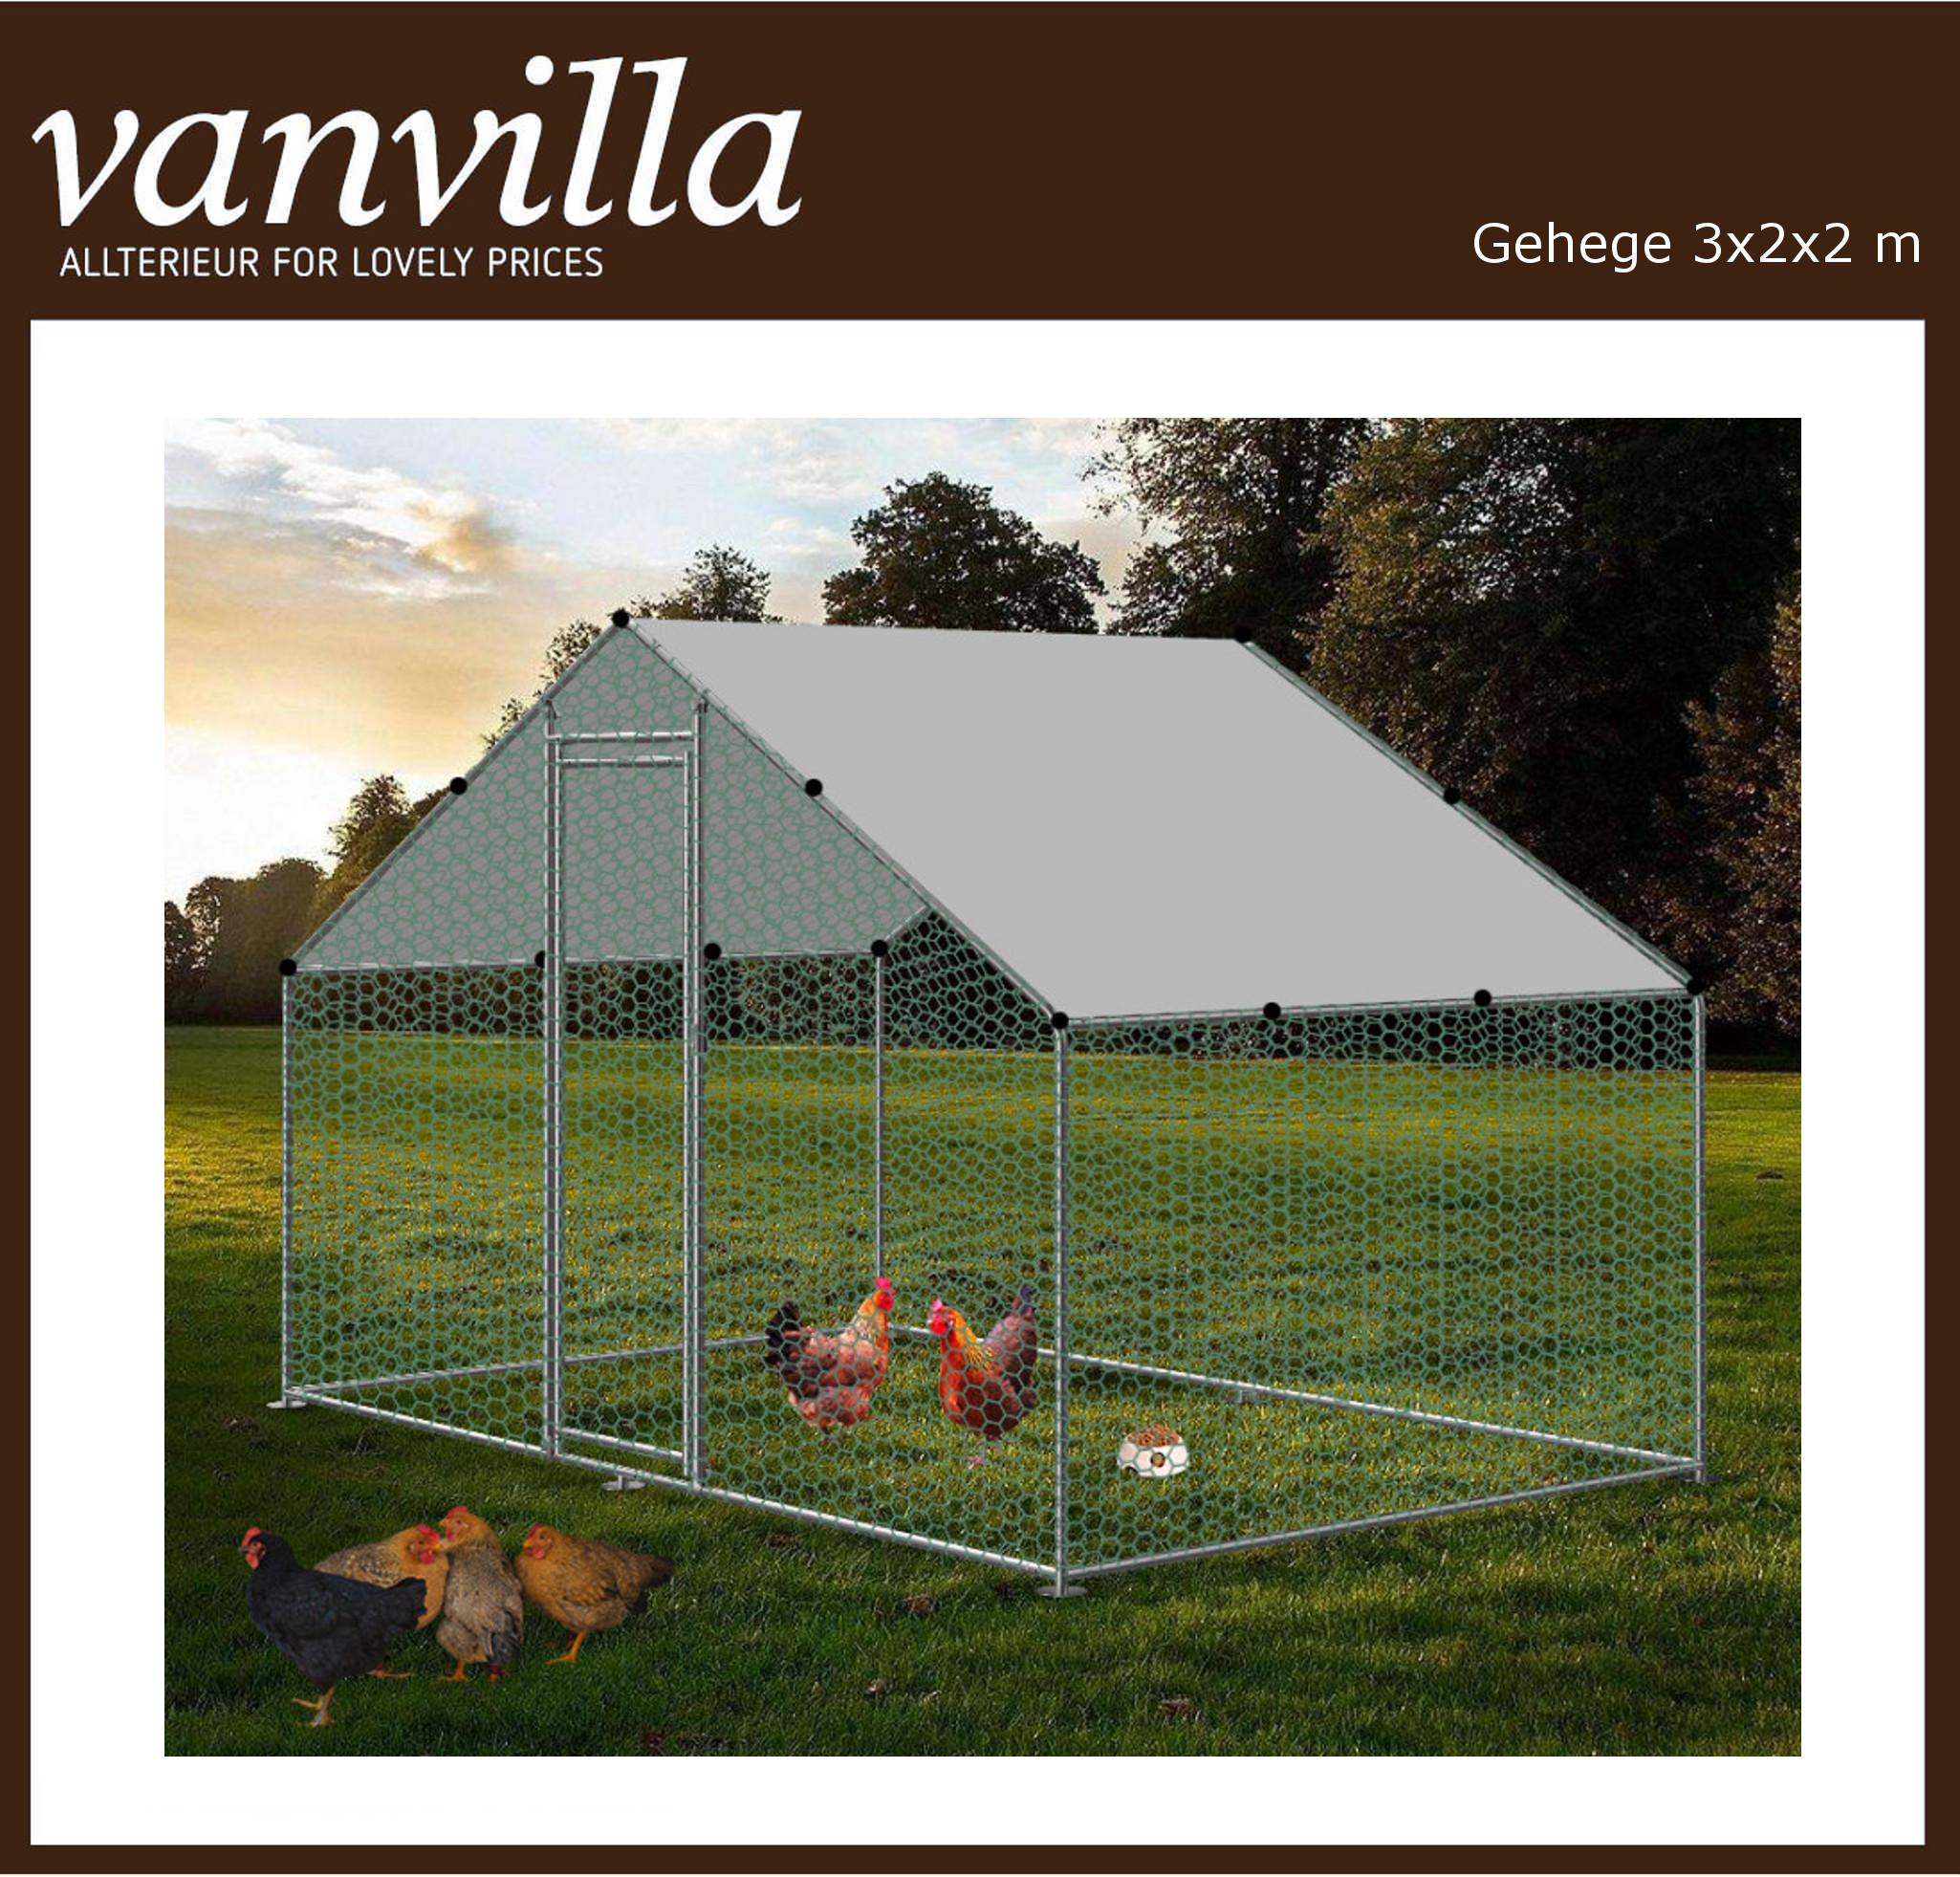 vanvilla Tiergehege Freilaufgehege Hühnerstall Stahlrahmen mit Drahtgewebe RA322